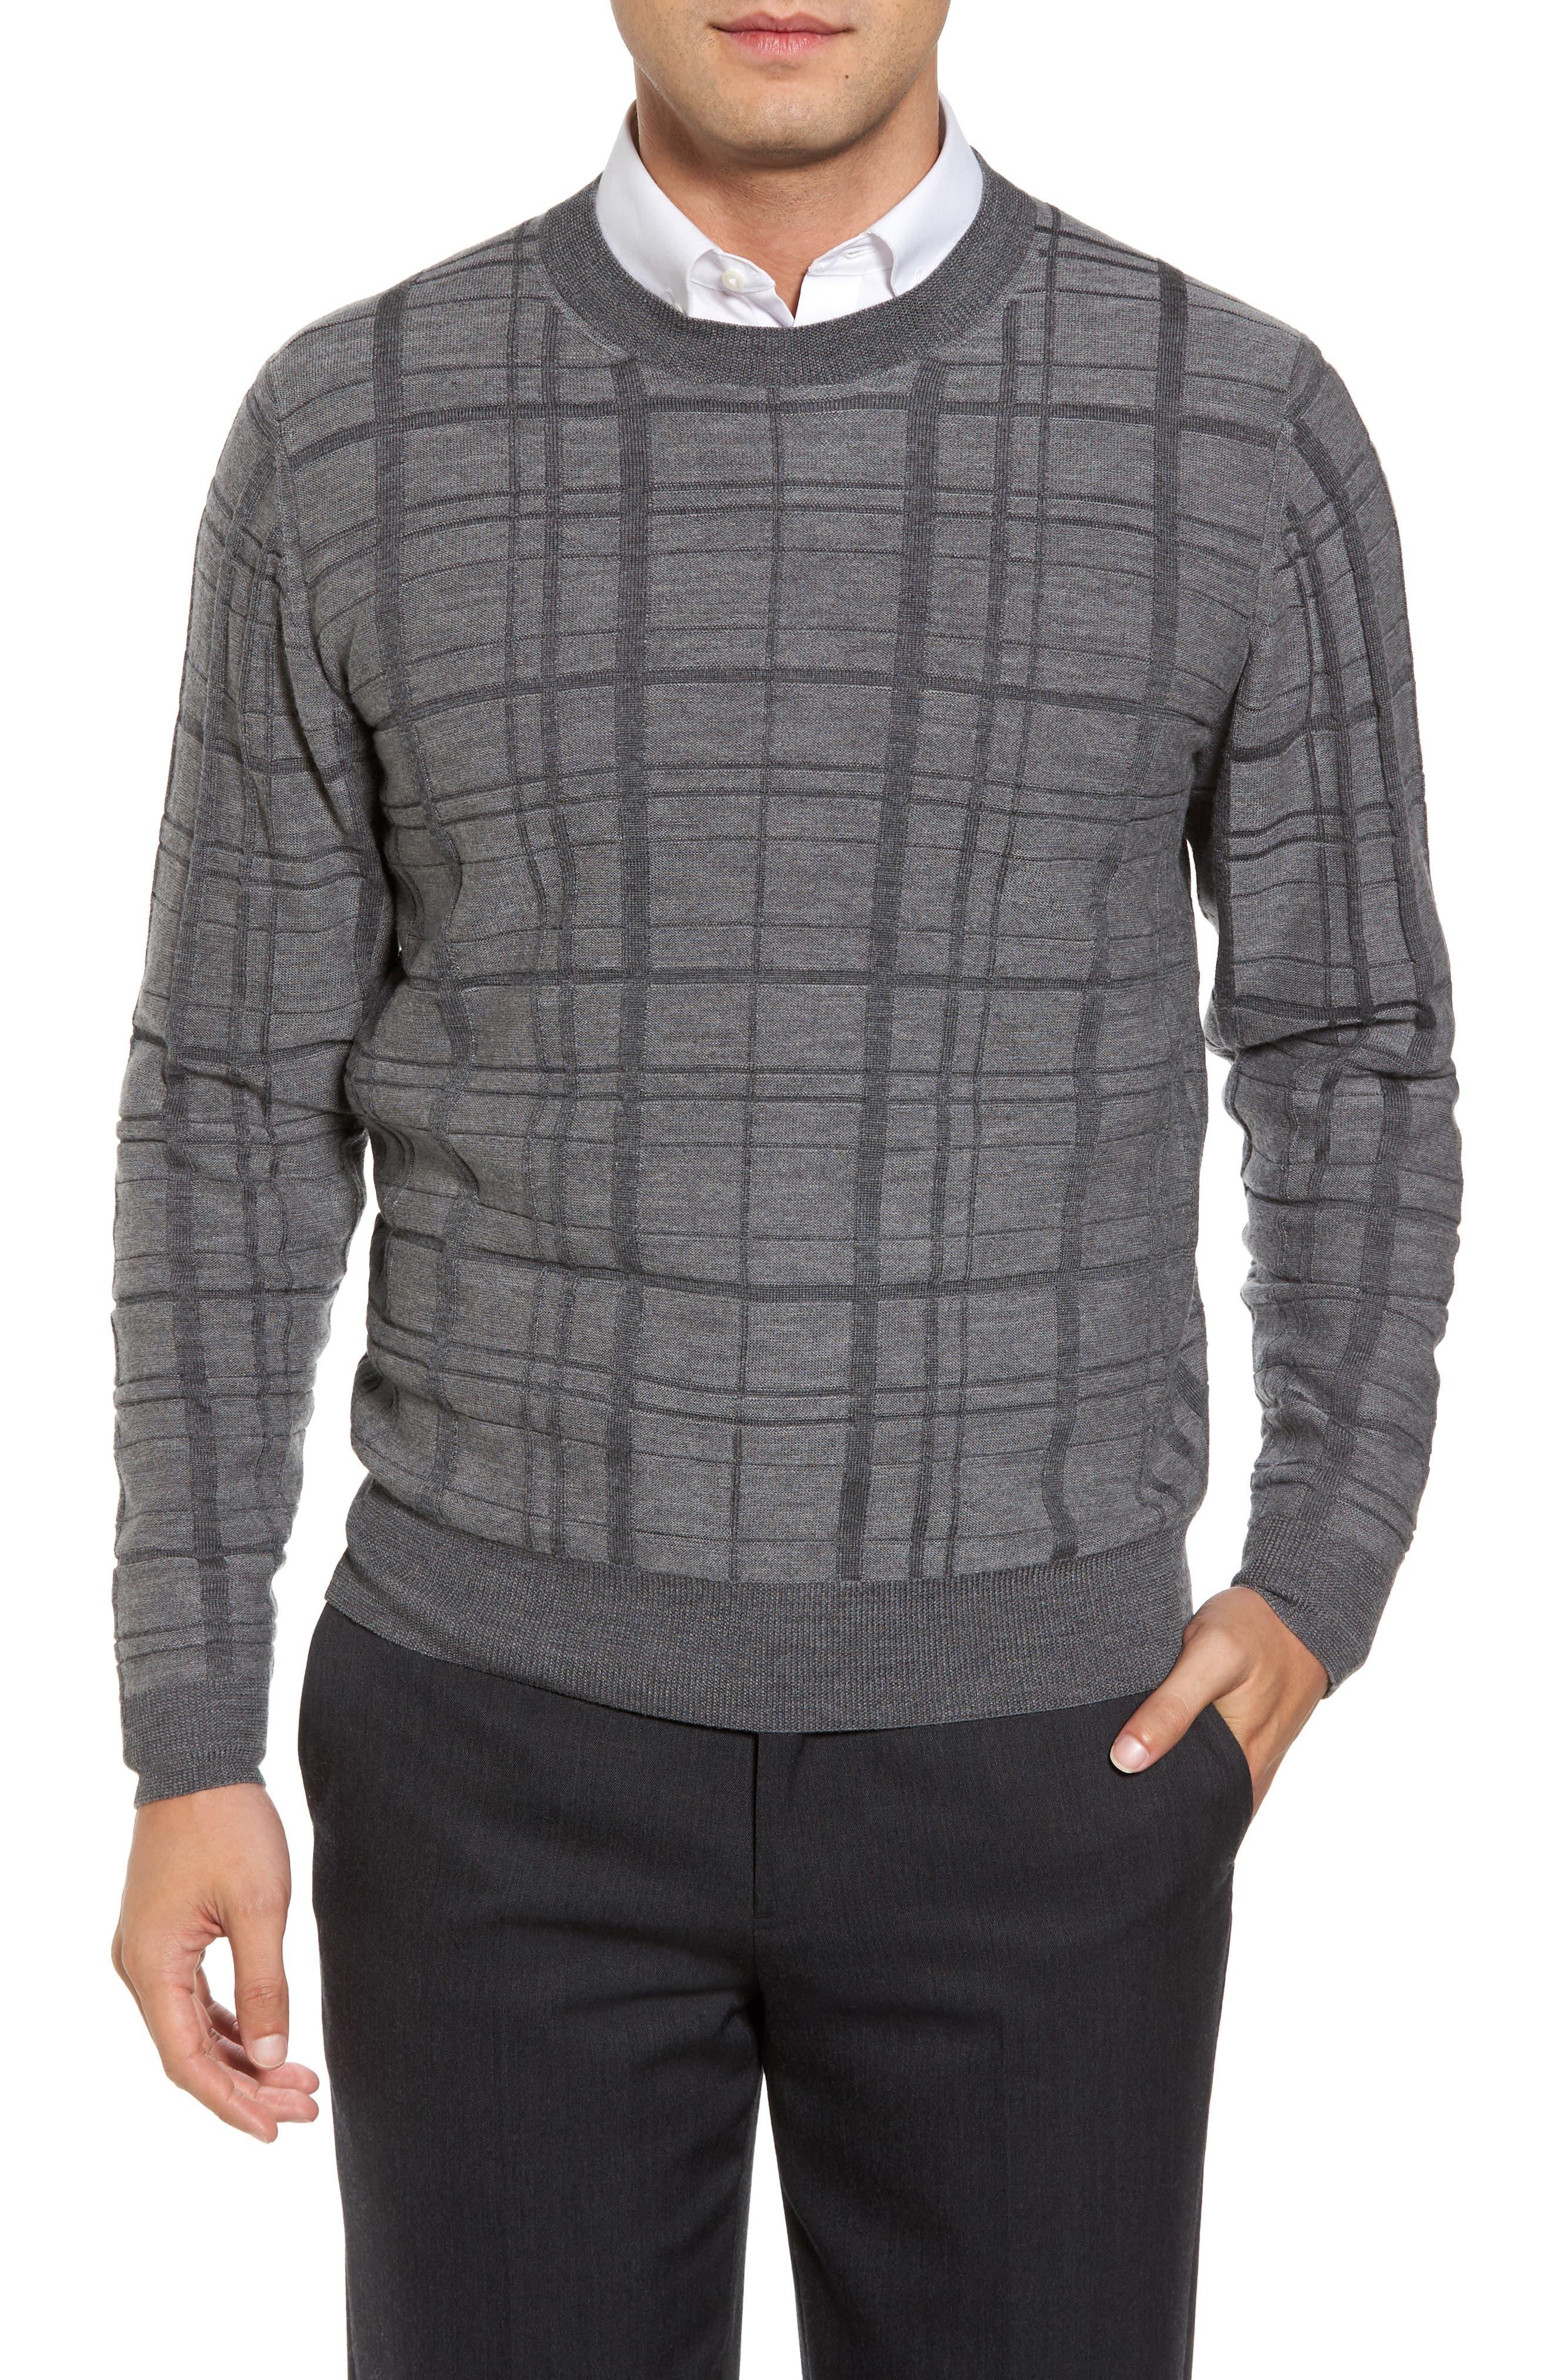 Alternate Image 1 Selected - Bobby Jones Tonal Grid Wool Sweater